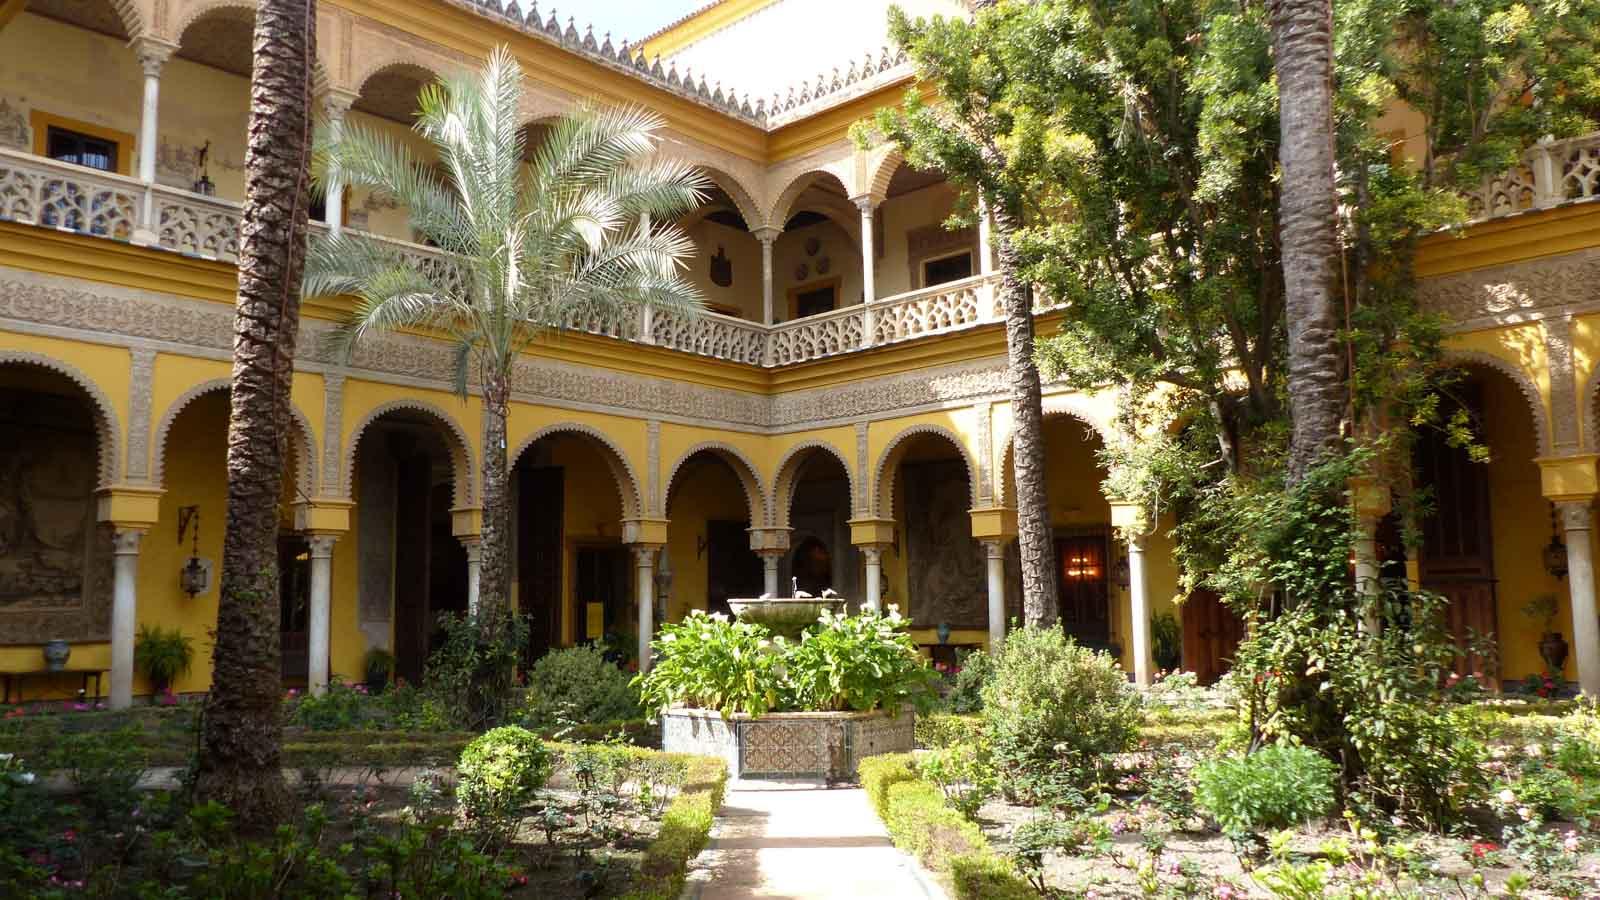 seville duchess alba palace